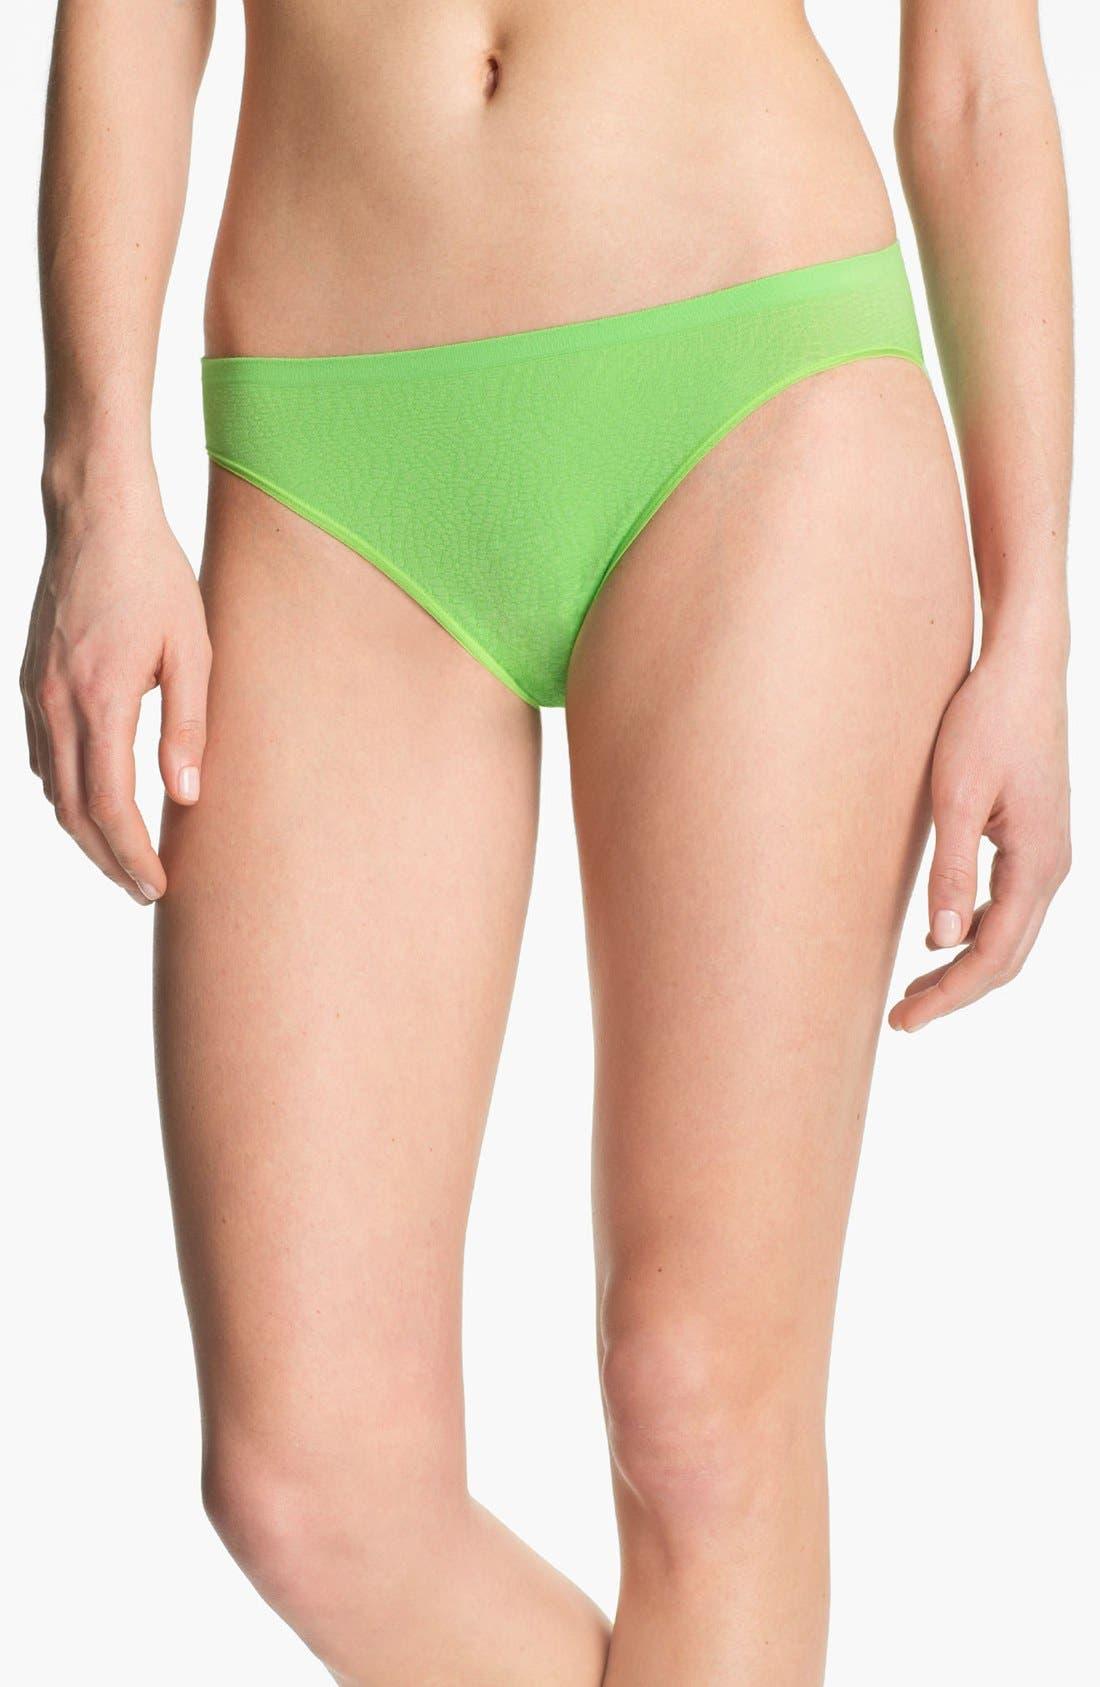 Alternate Image 1 Selected - Shimera 'Python' High Cut Bikini